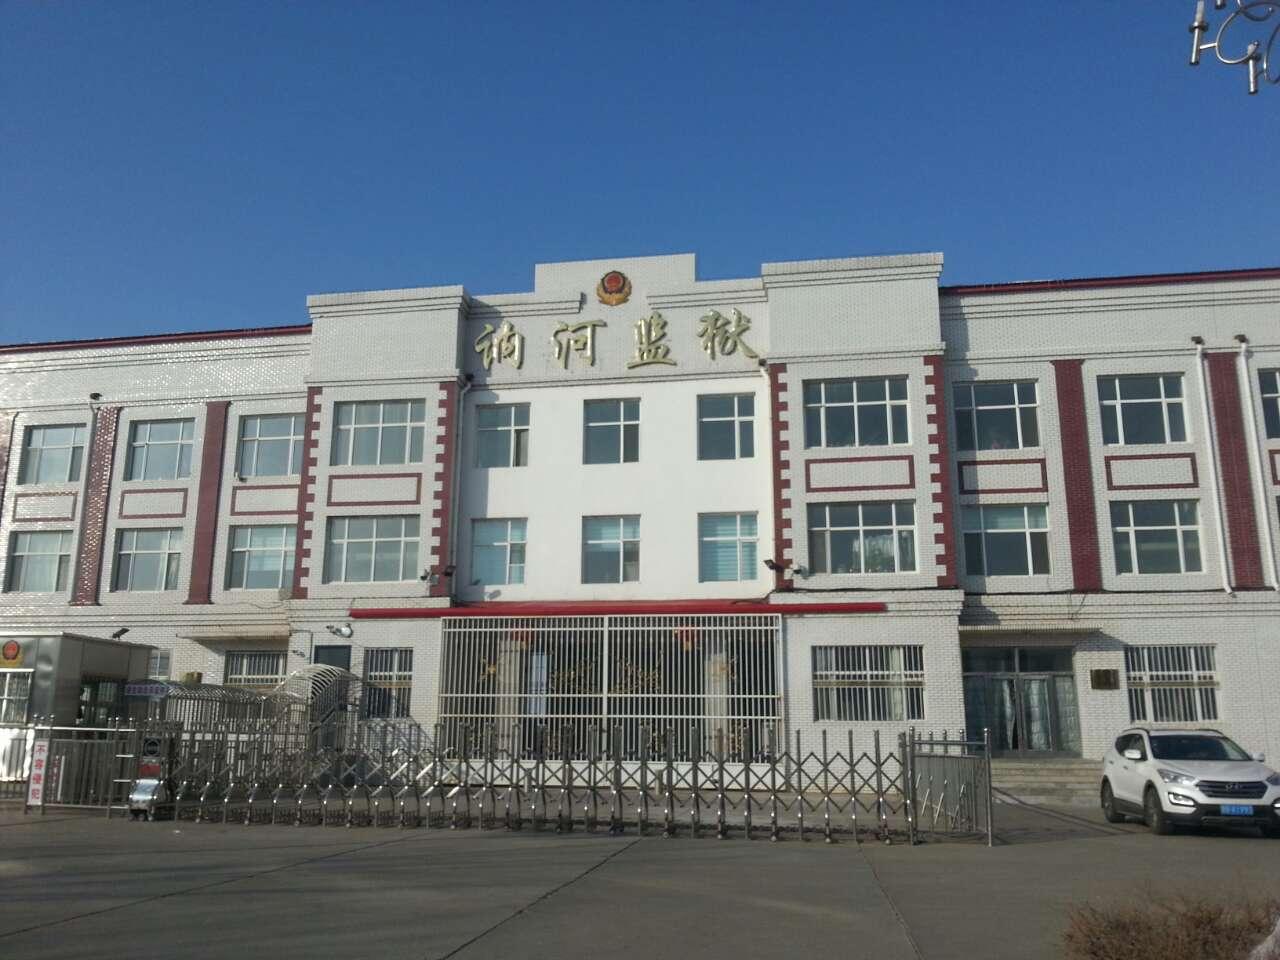 http://www.qezov.club/tiyuhuodong/216354.html